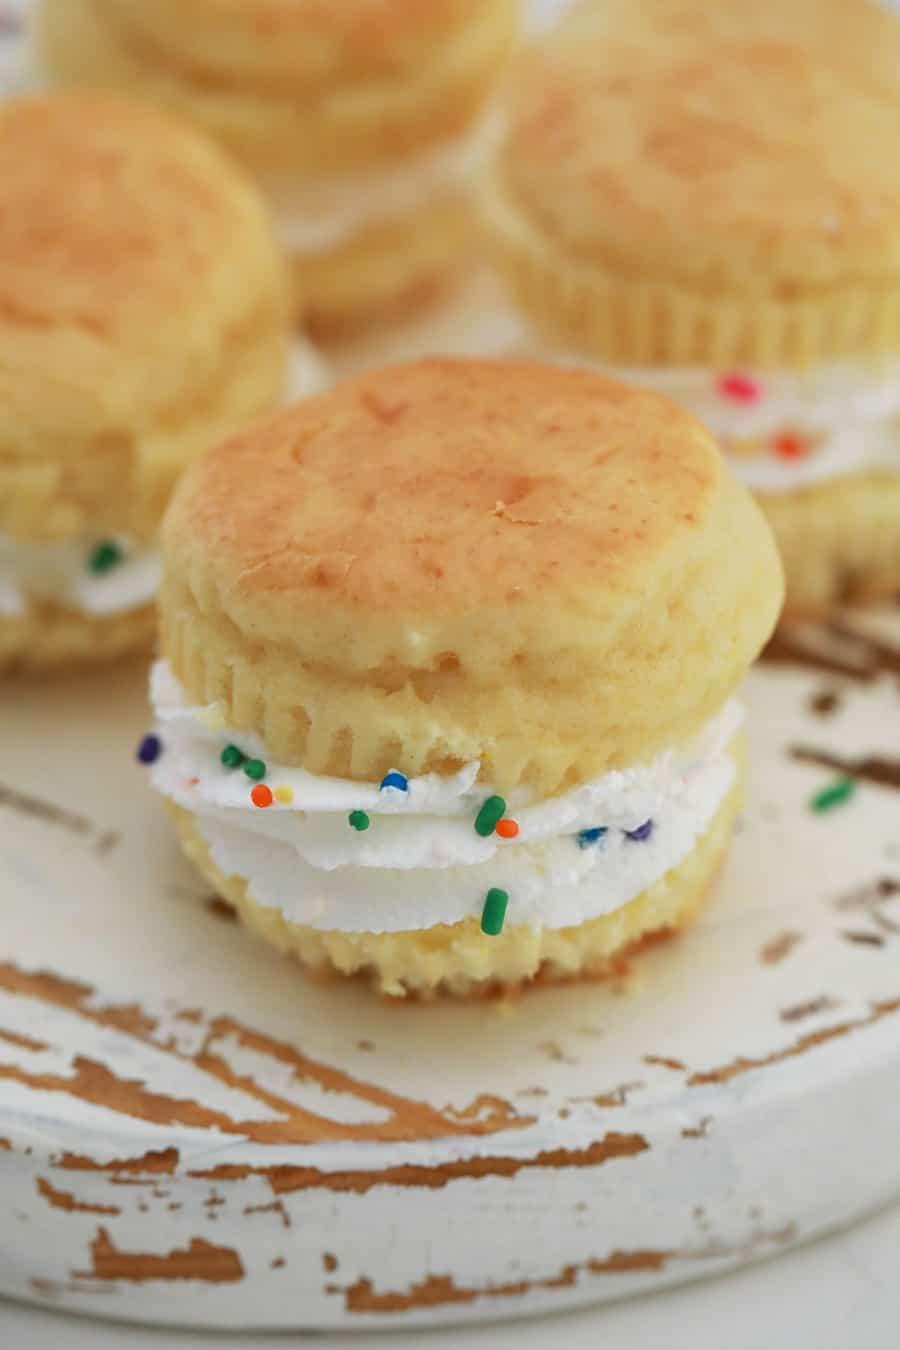 Cupcake Sandwich Hack